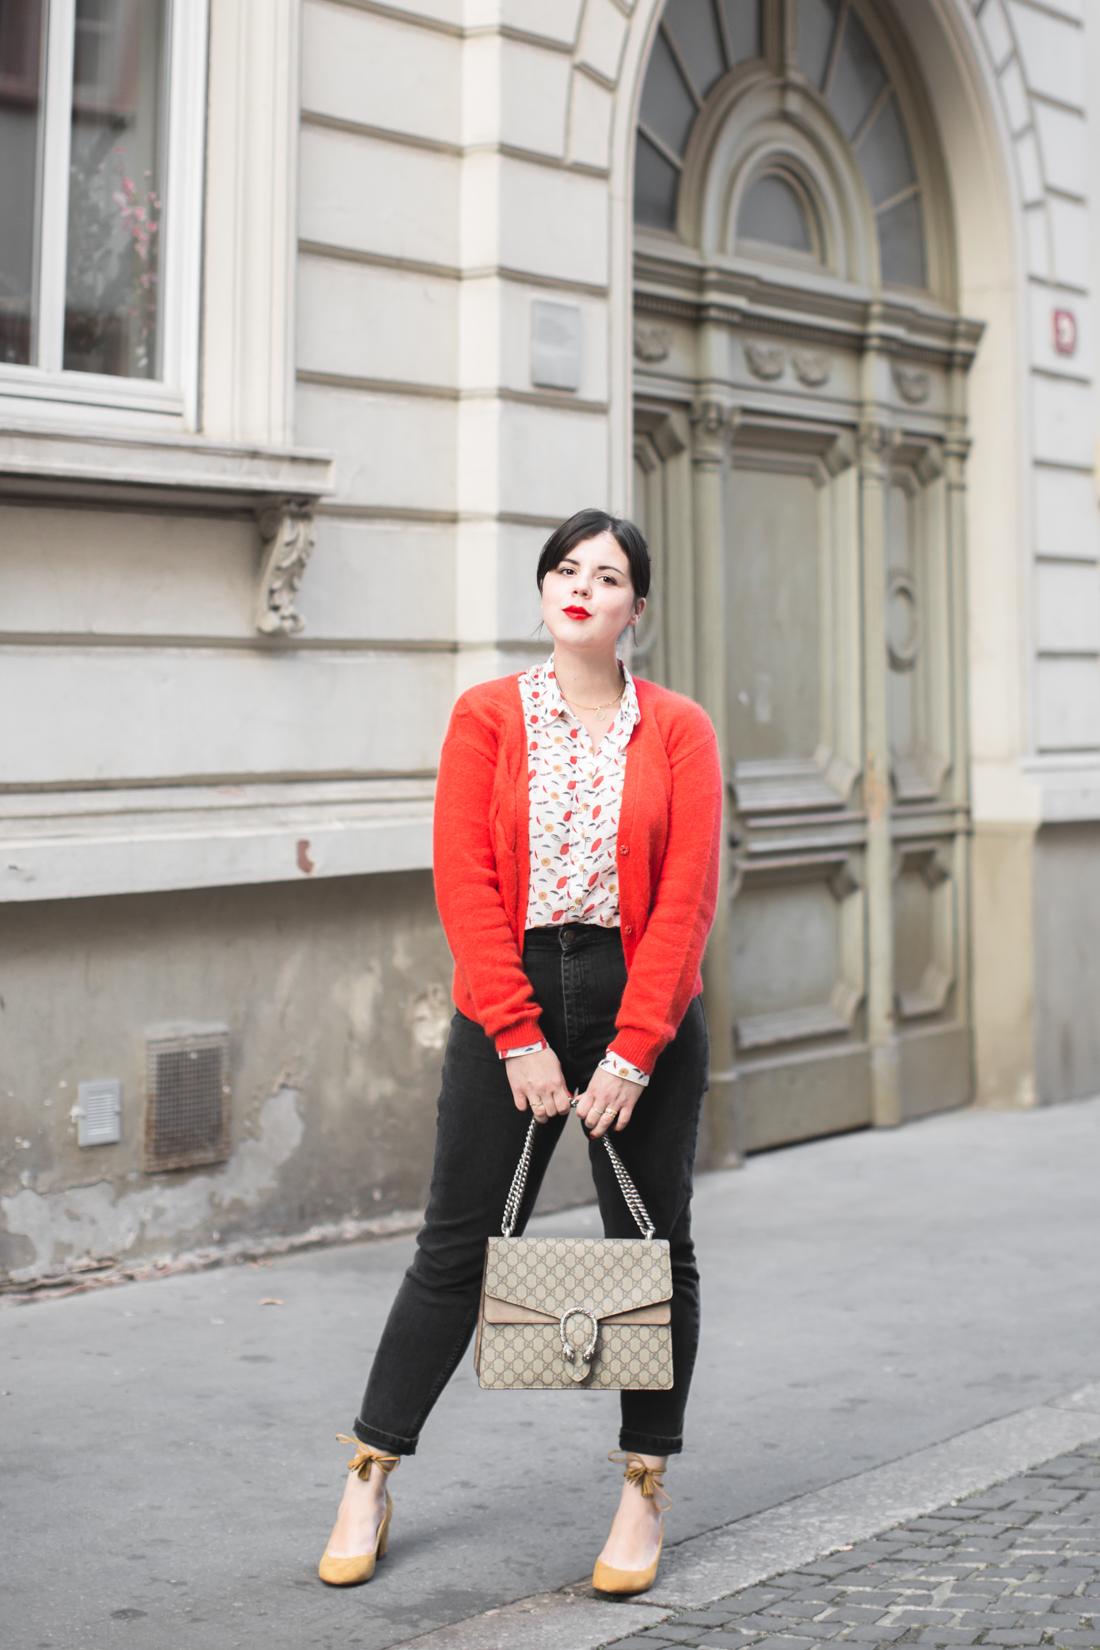 sezane-chemise-imprimee-valentina-curry-copyright-pauline-paulinefashionblog-com-6